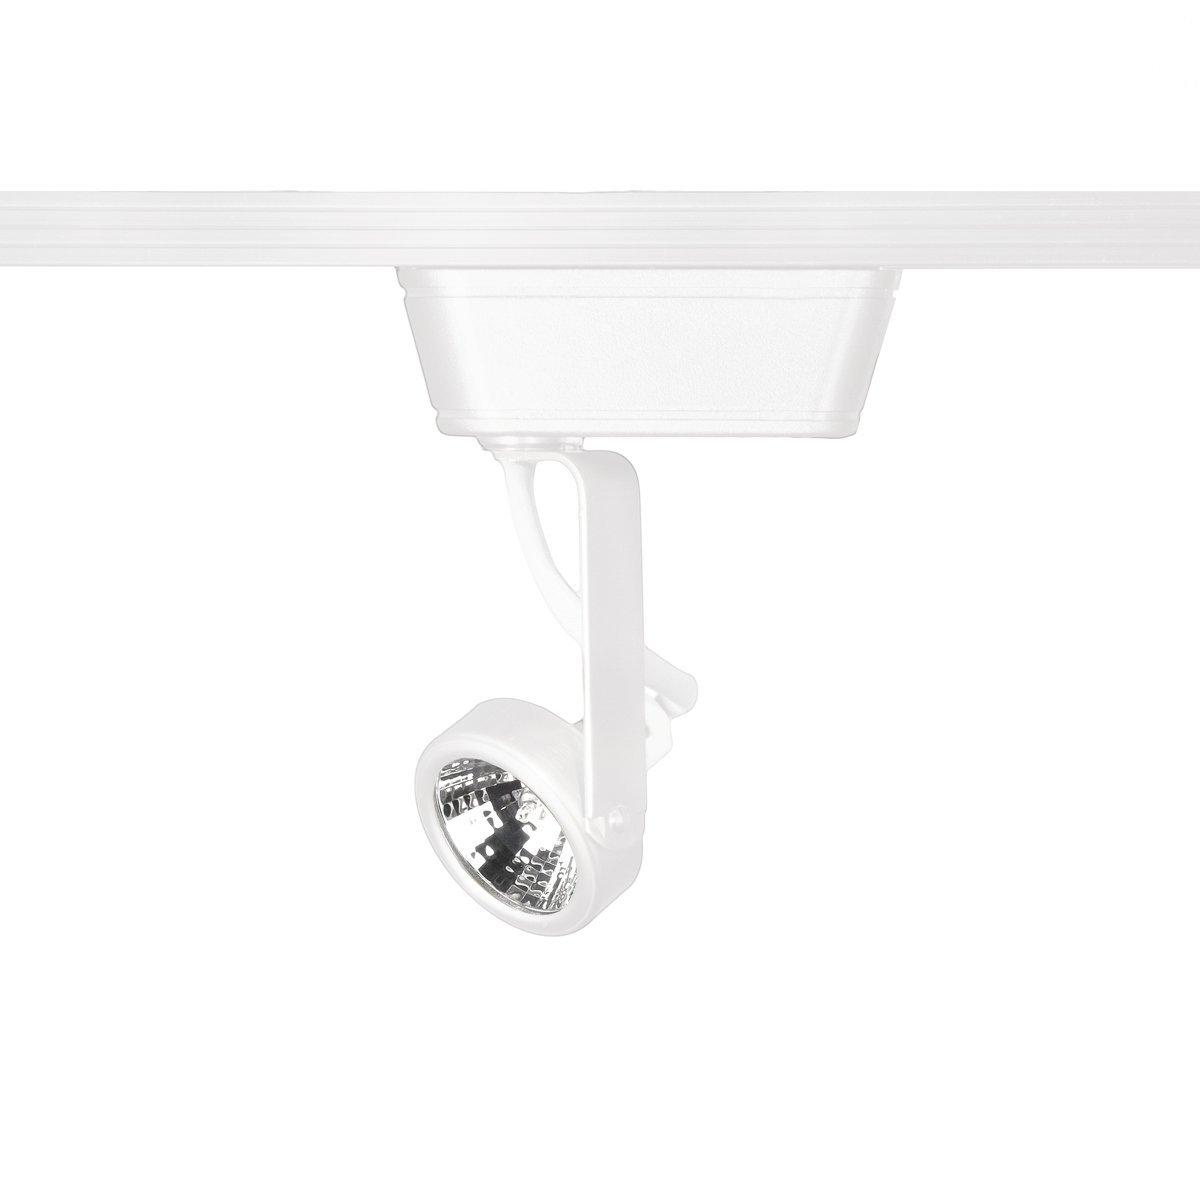 WAC Lighting HHT-180-WT H Series Low Voltage Track Head, 50W